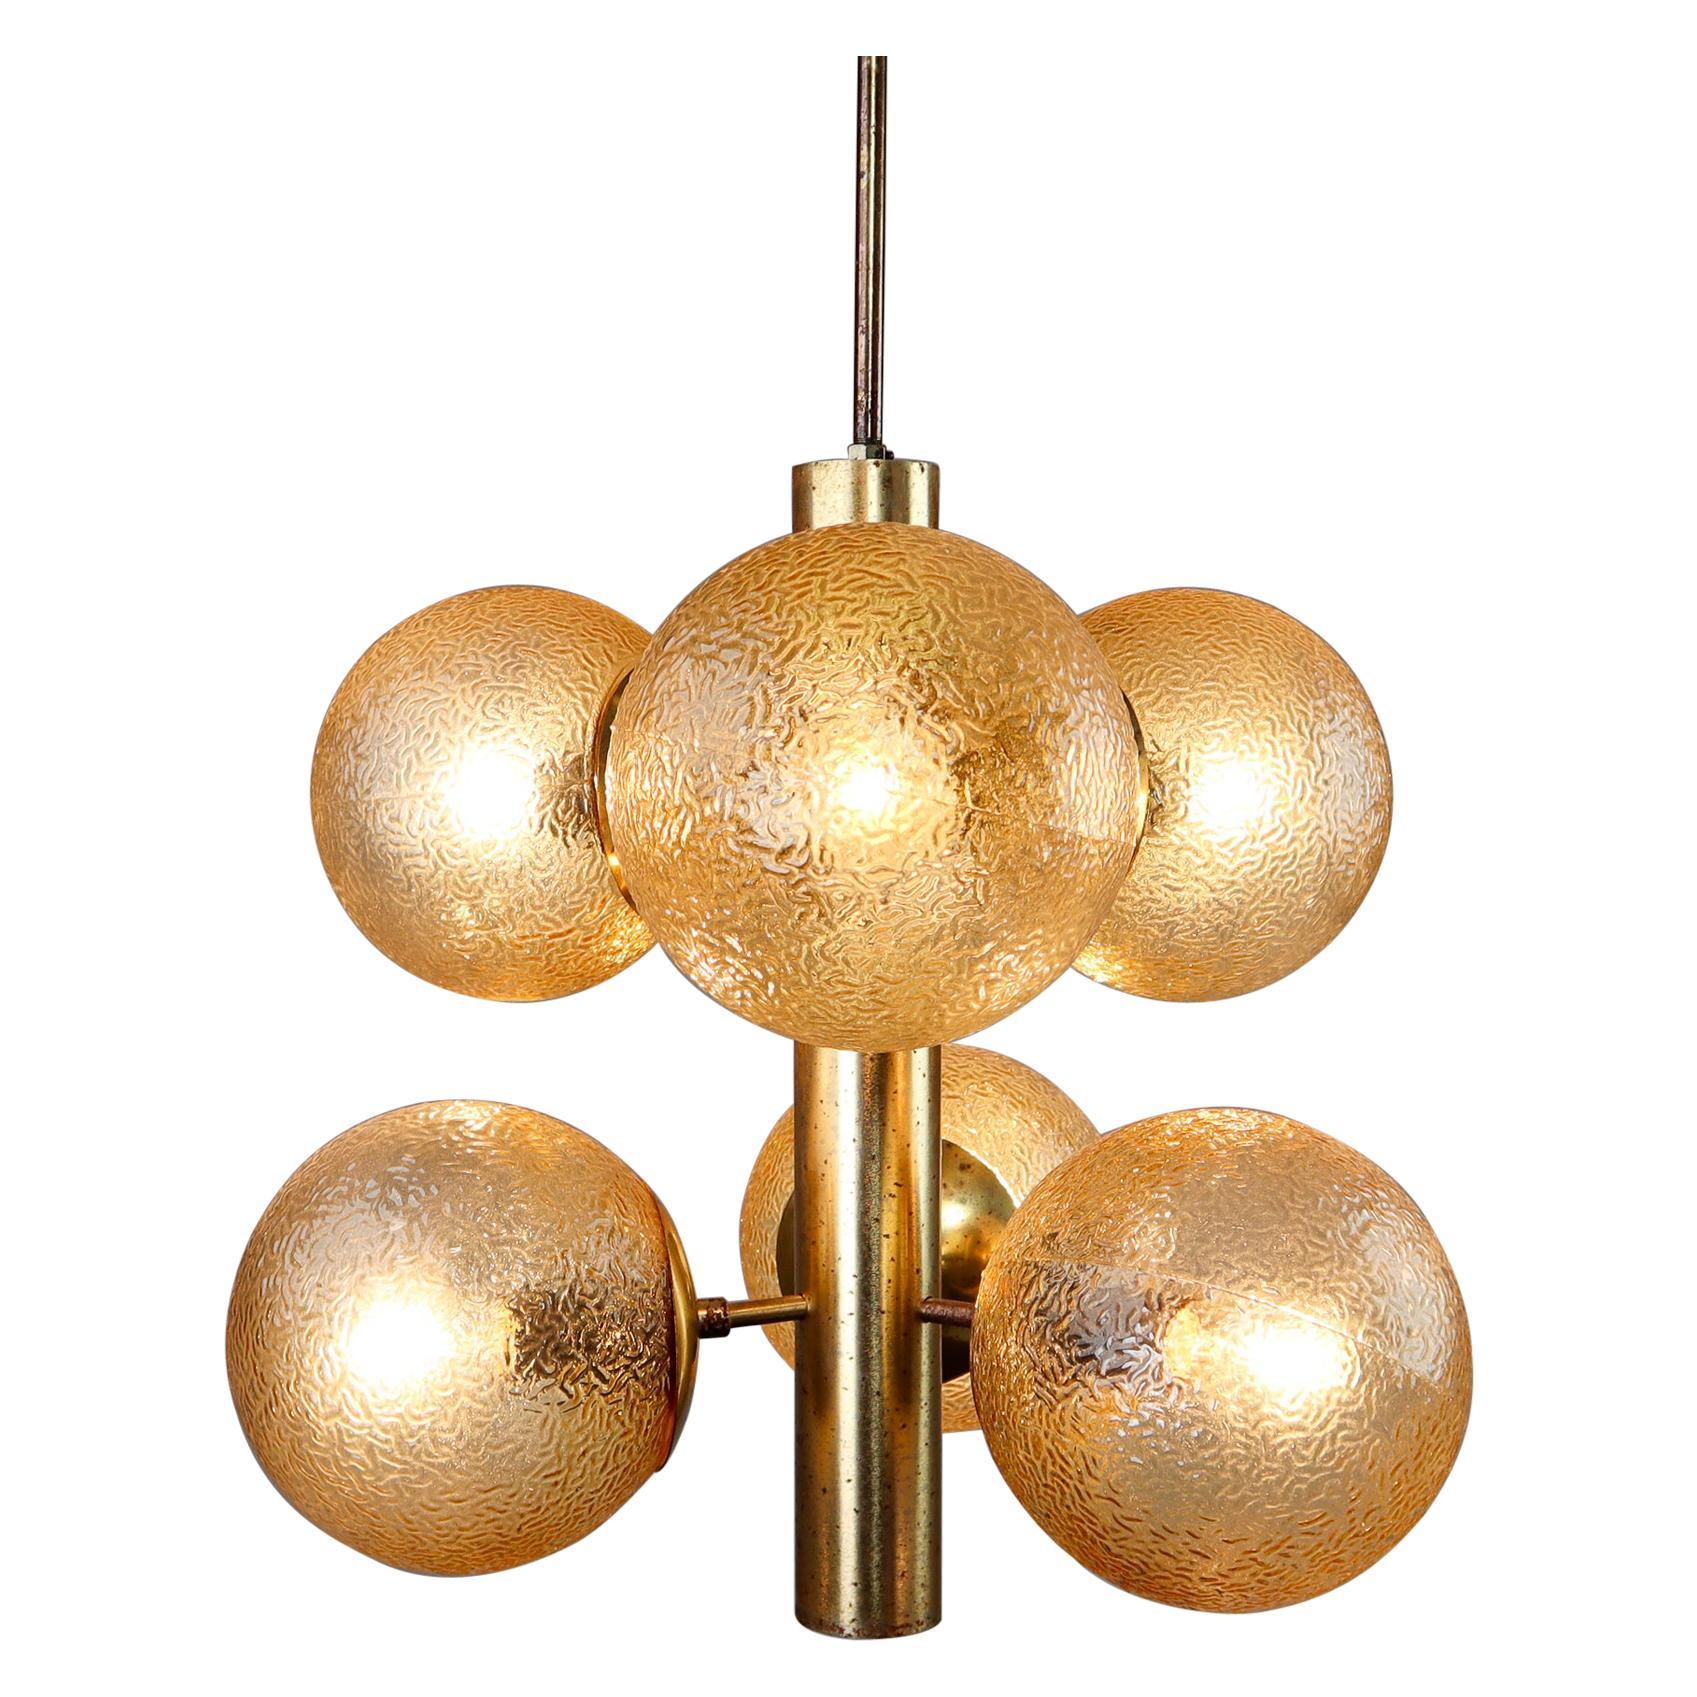 Stunning Kaiser Sputnik Glass Globes Patinated Brass Chandelier, Germany, 1970s